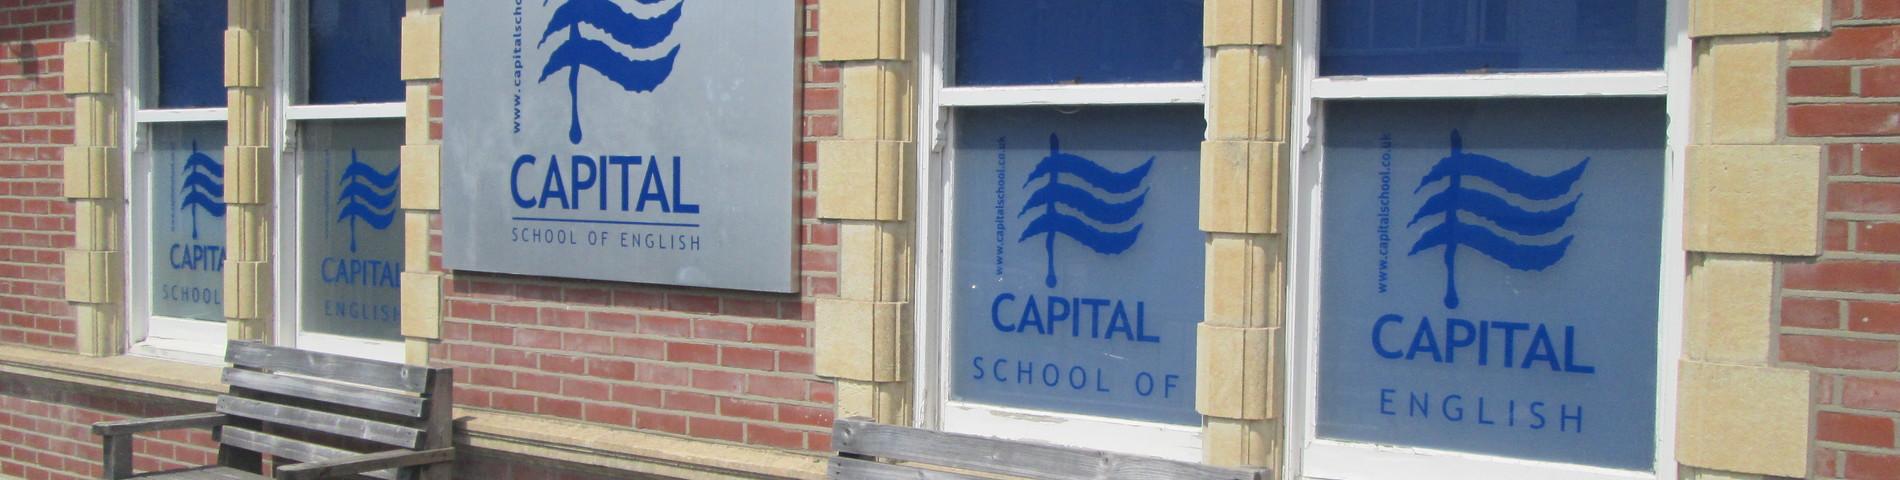 Capital School of English foto 1